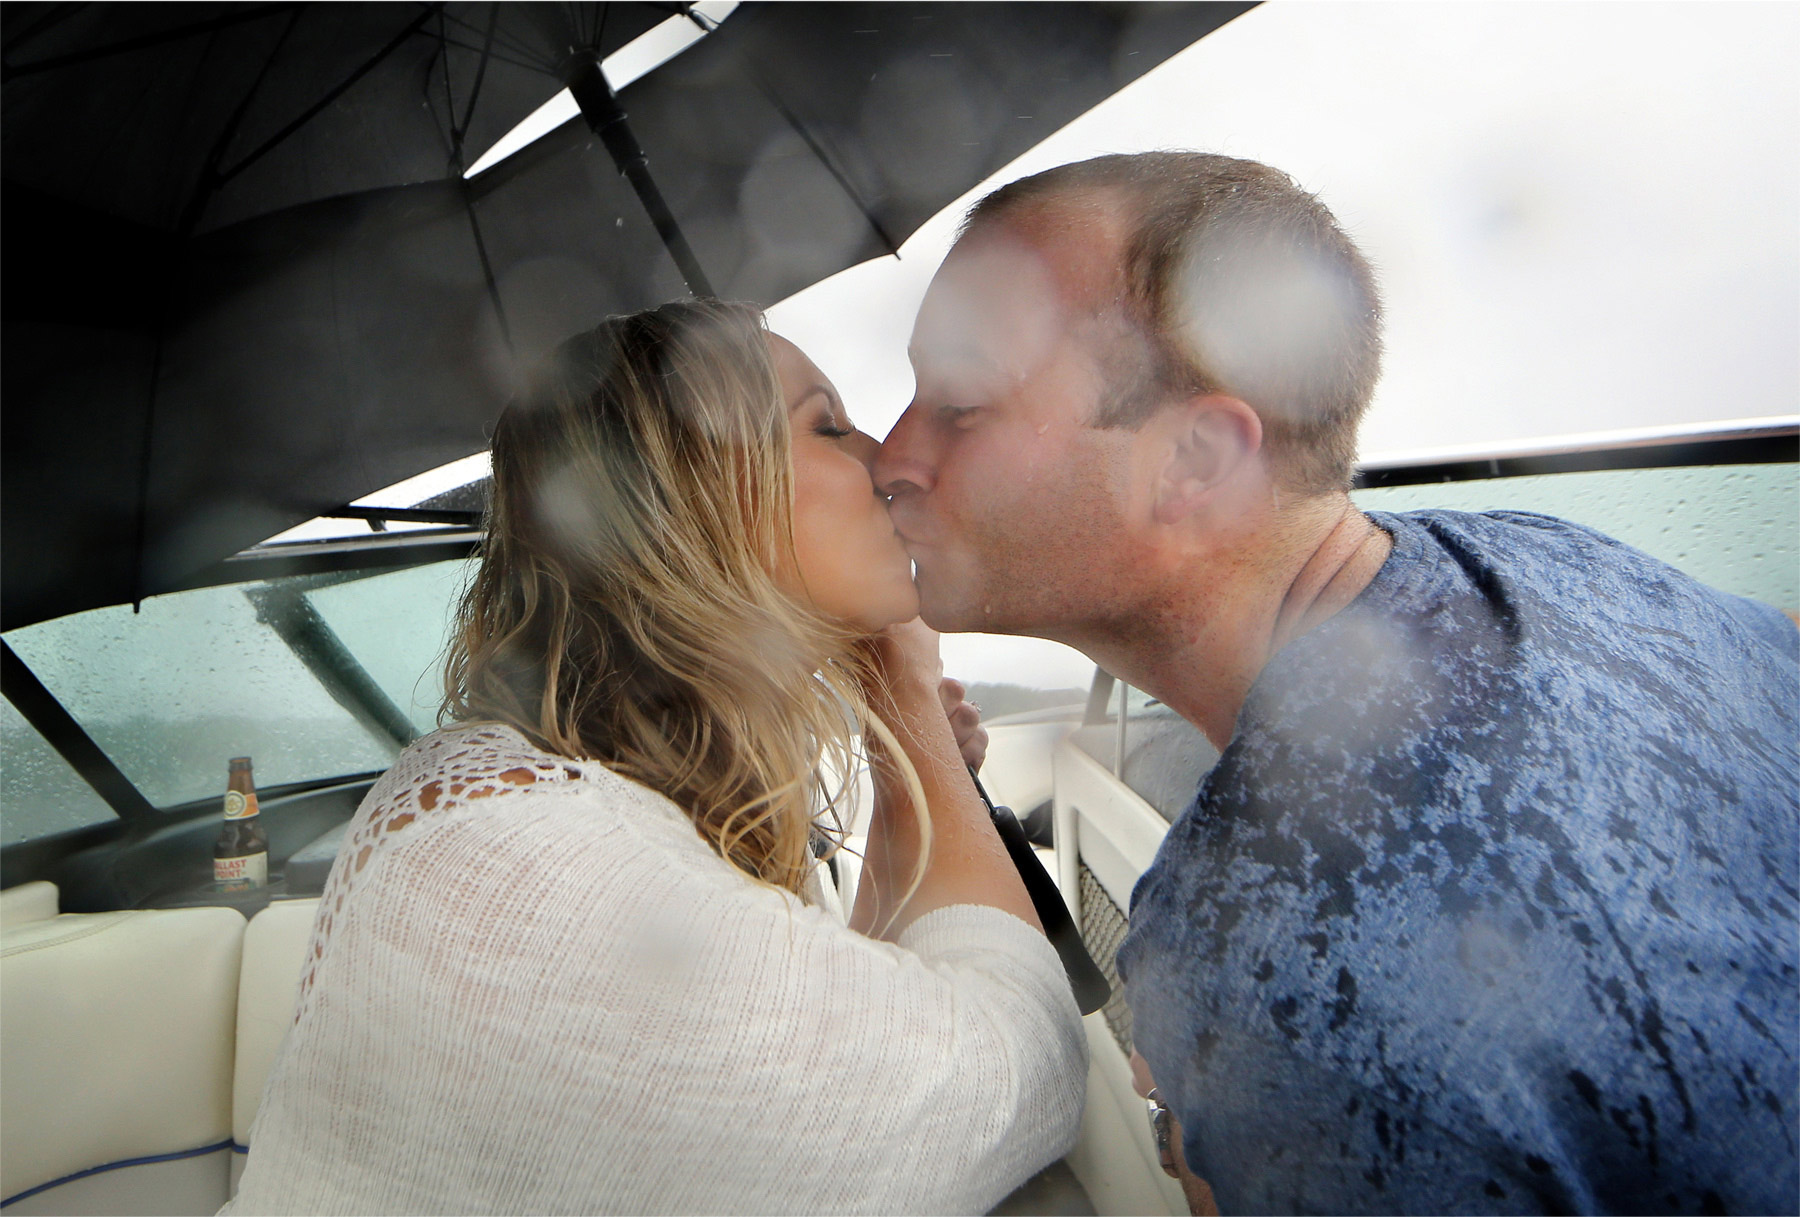 11-Wayzata-Minnesota-Engagement-Photographer-by-Andrew-Vick-Photography-Summer-Lake-Minnetonka-Umbrella-Rain-Kiss-Speed-Boat-Ashley-&-Kasey.jpg